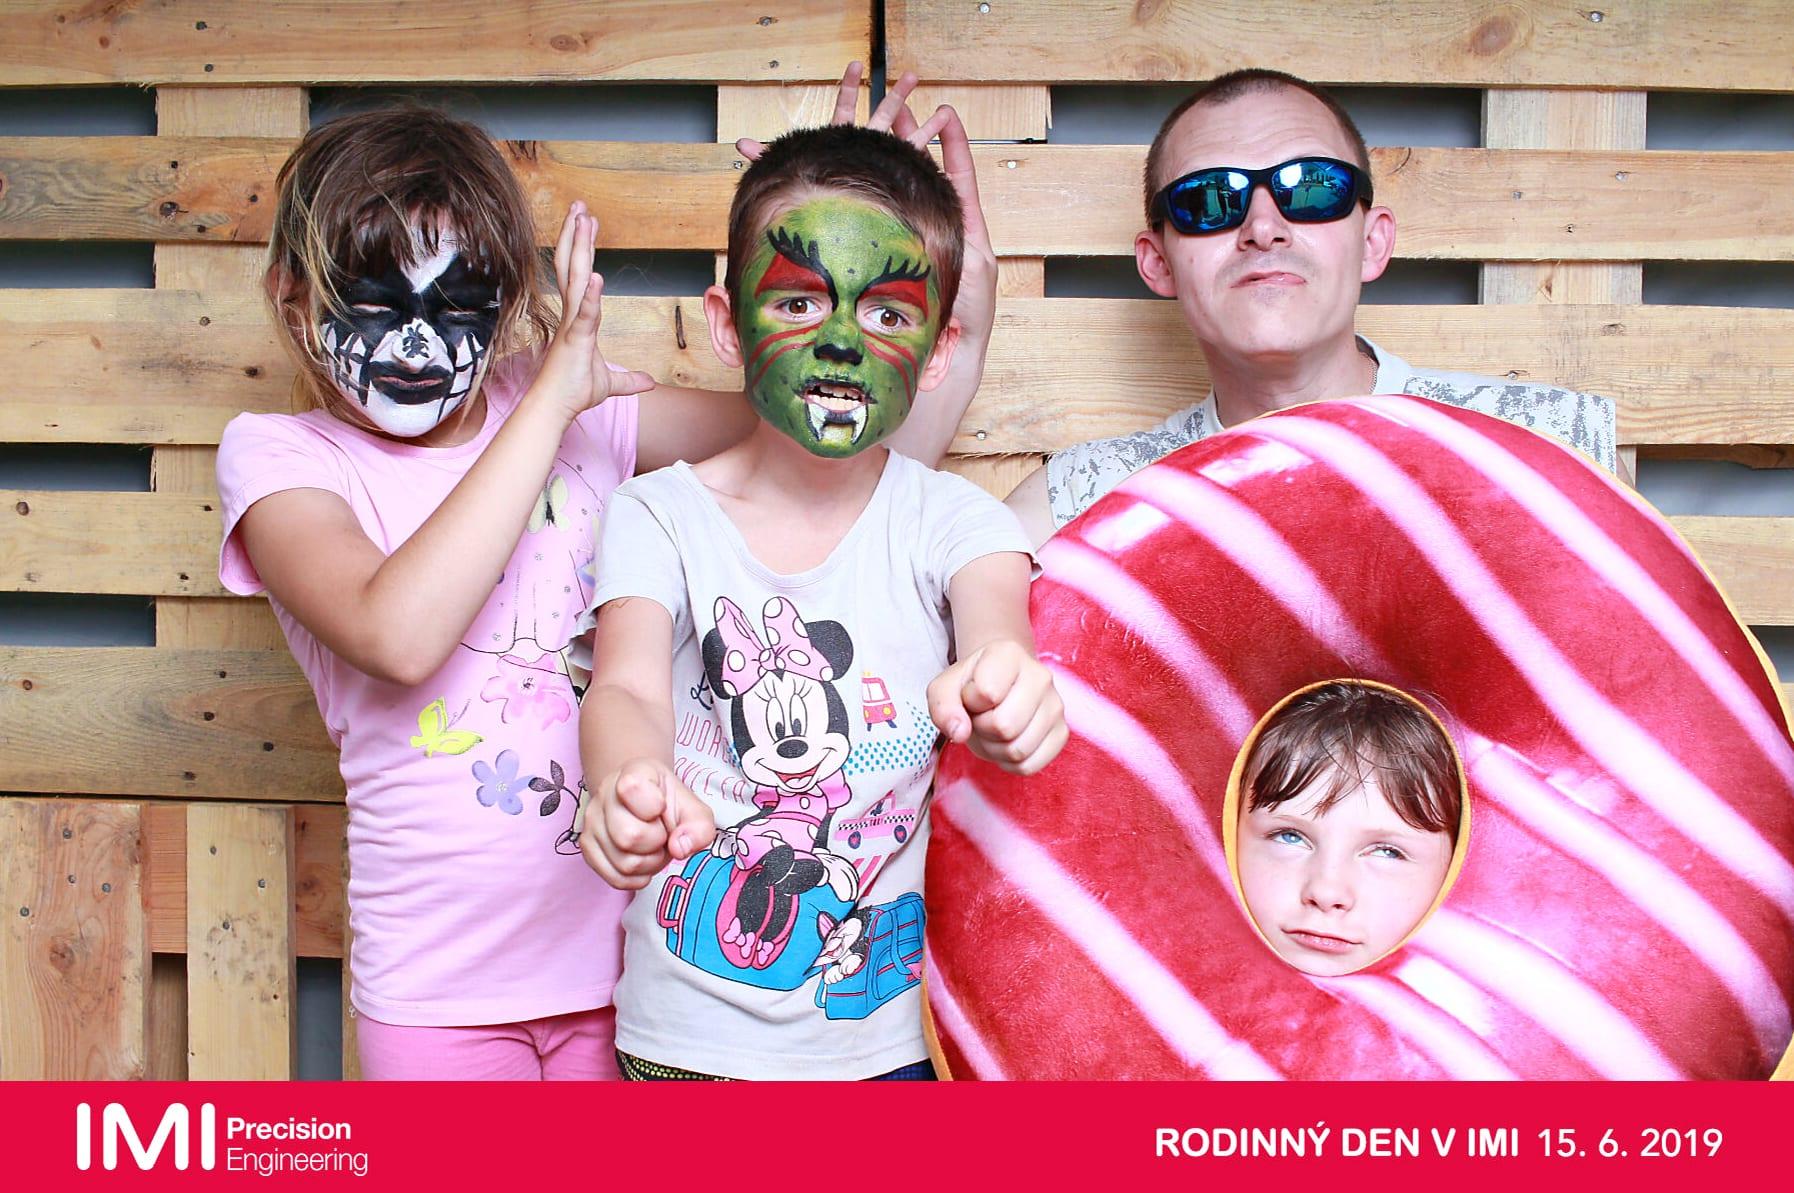 fotokoutek-rodinny-den-v-imi-15-6-2019-626199